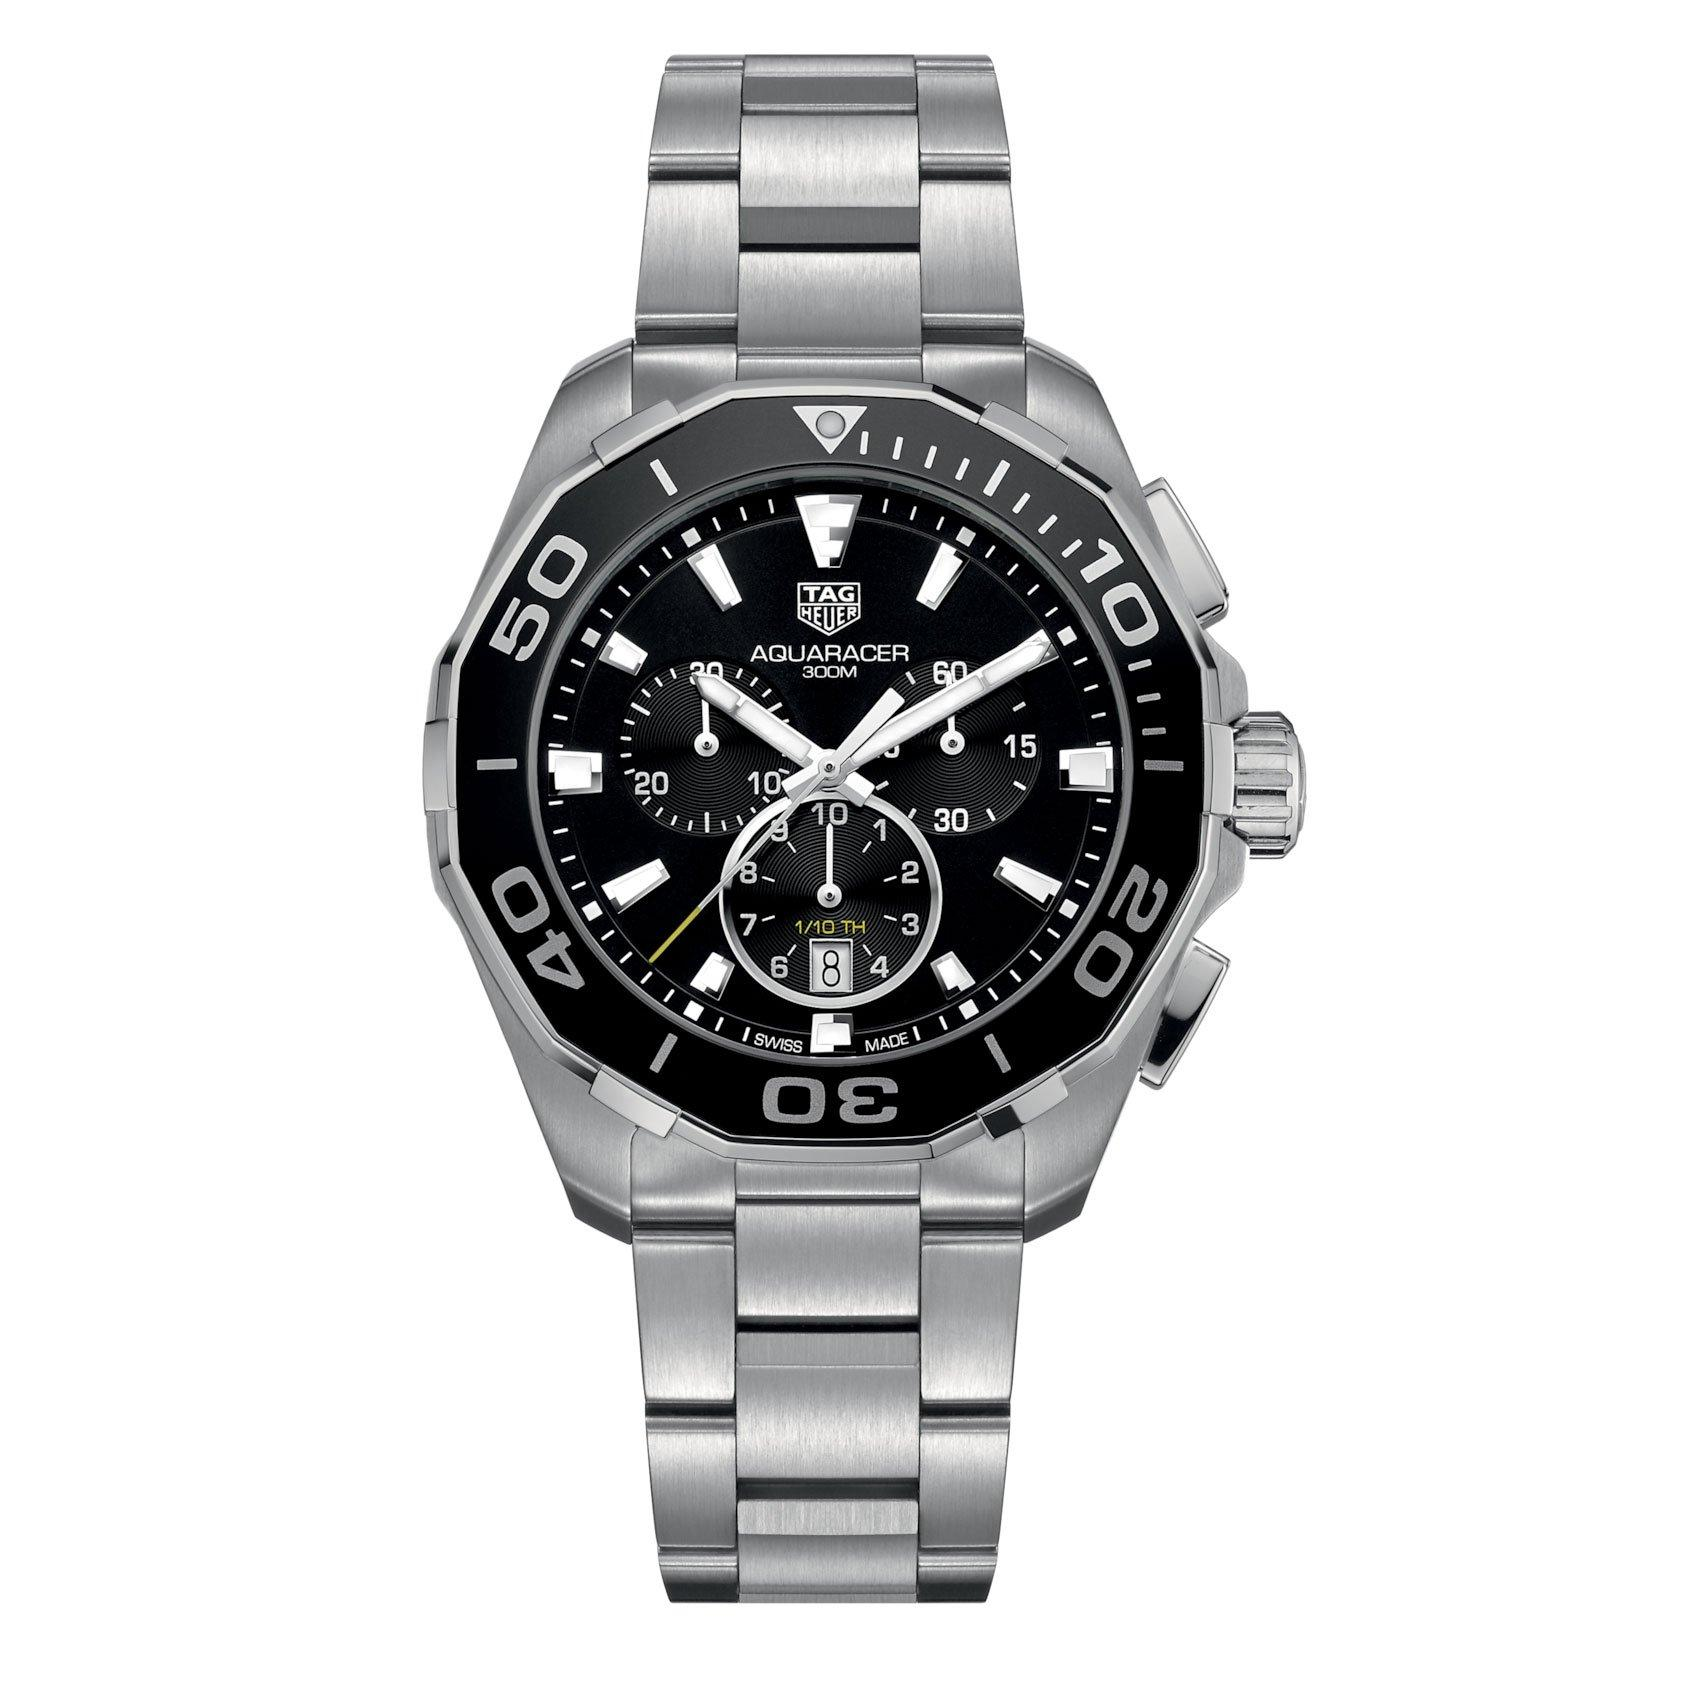 TAG Heuer Aquaracer Chronograph Men's Watch